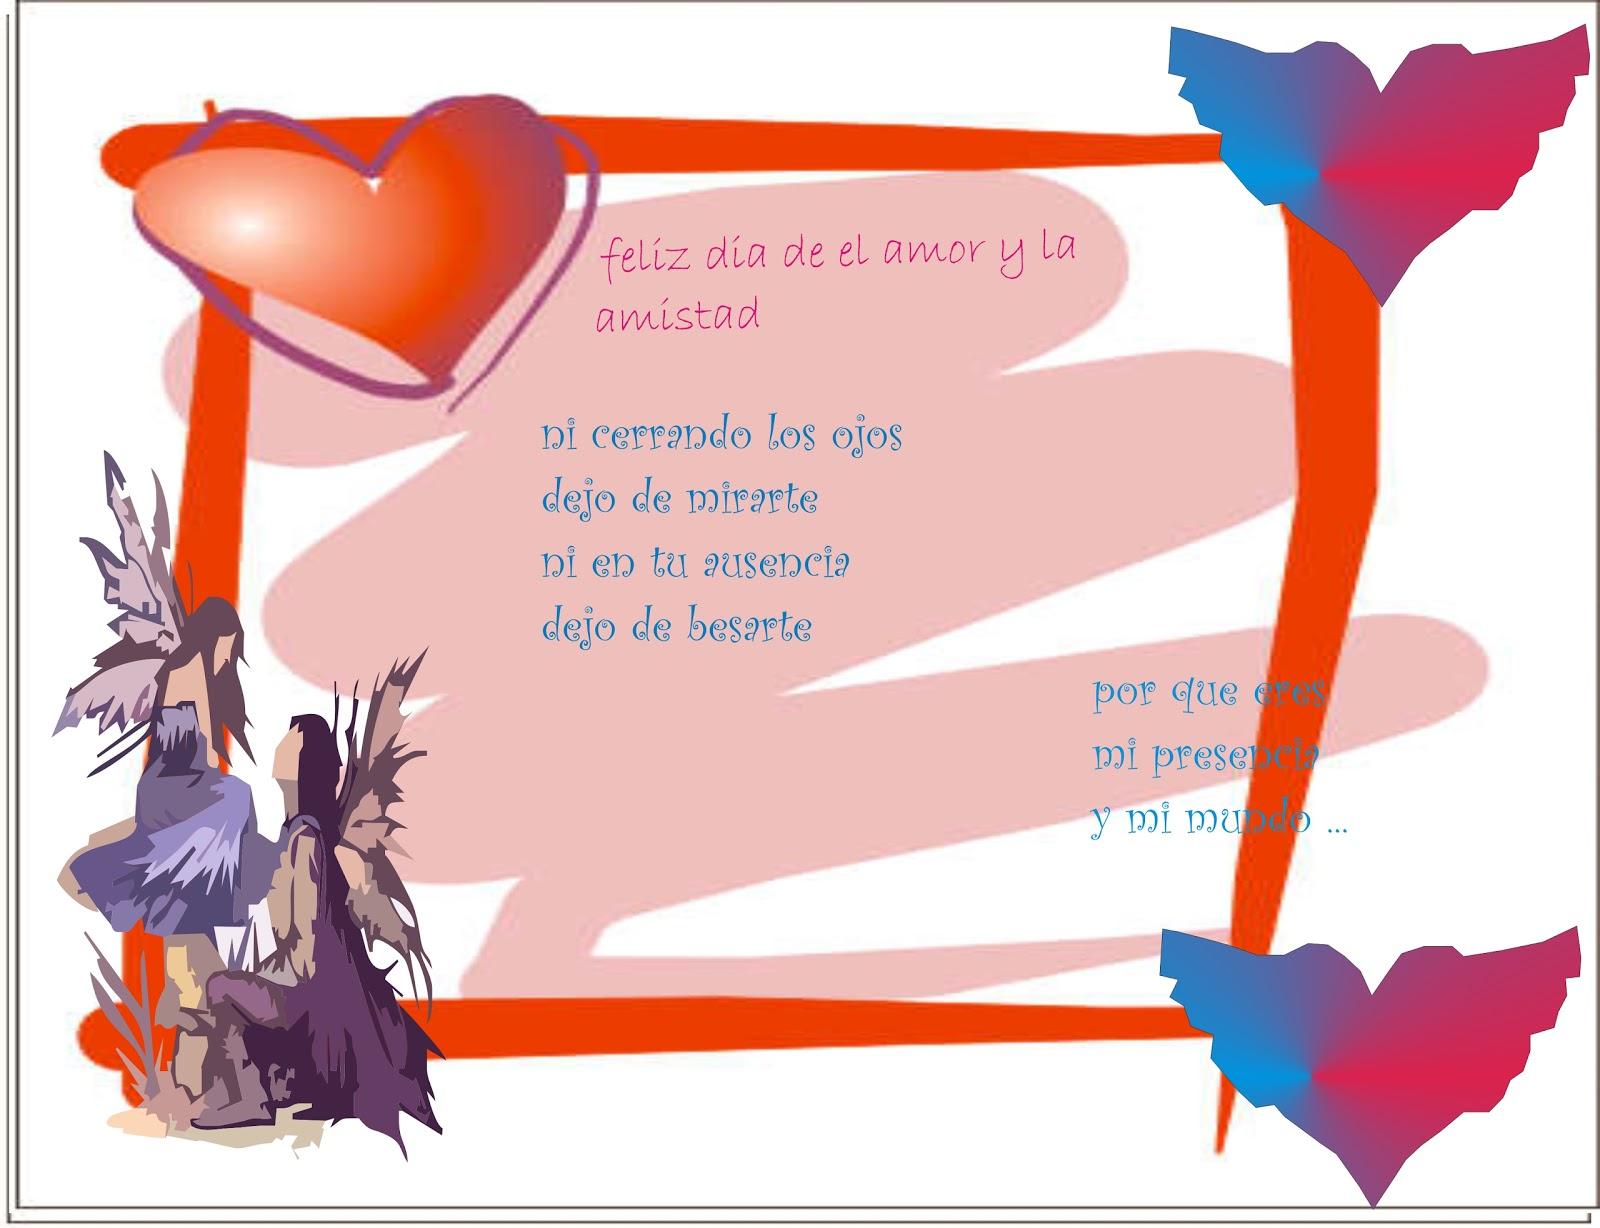 Imagenes Tarjetas De Amor - IMÁGENES Y TARJETAS DE AMOR Ministerio JENS